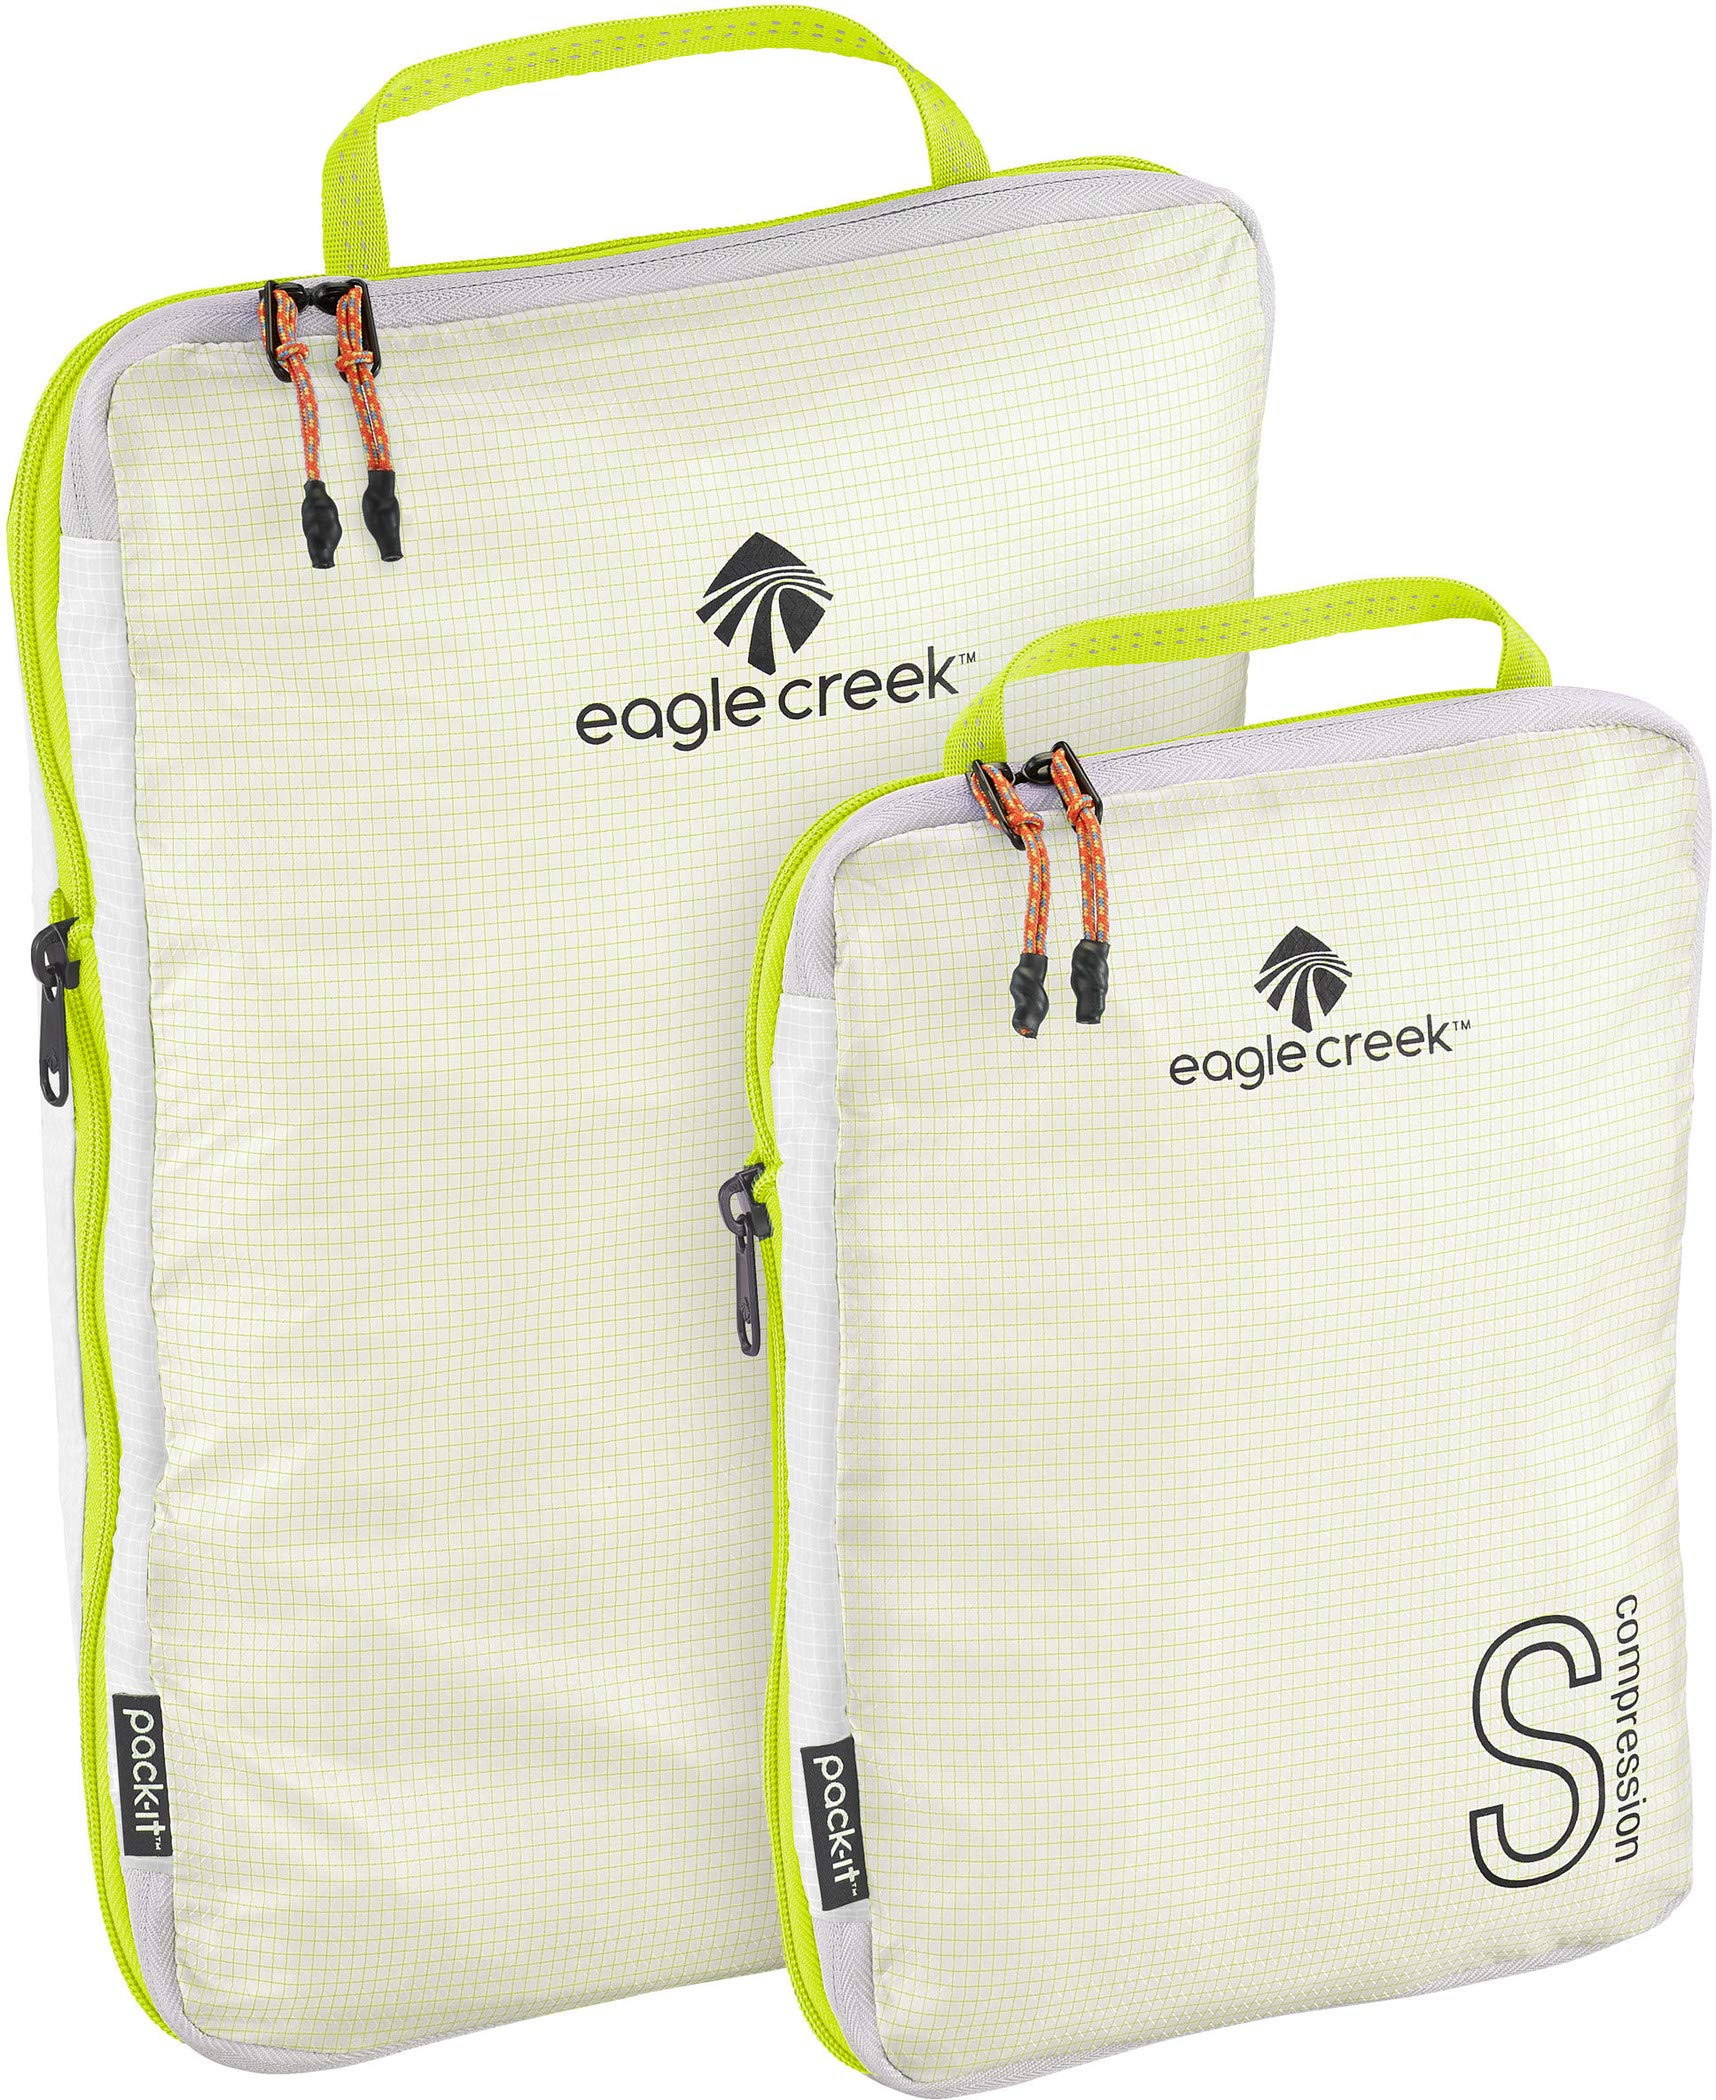 Eagle Creek Unisex Pack-It Specter Tech¿ Compression Cube Set S/M White/Strobe One Size